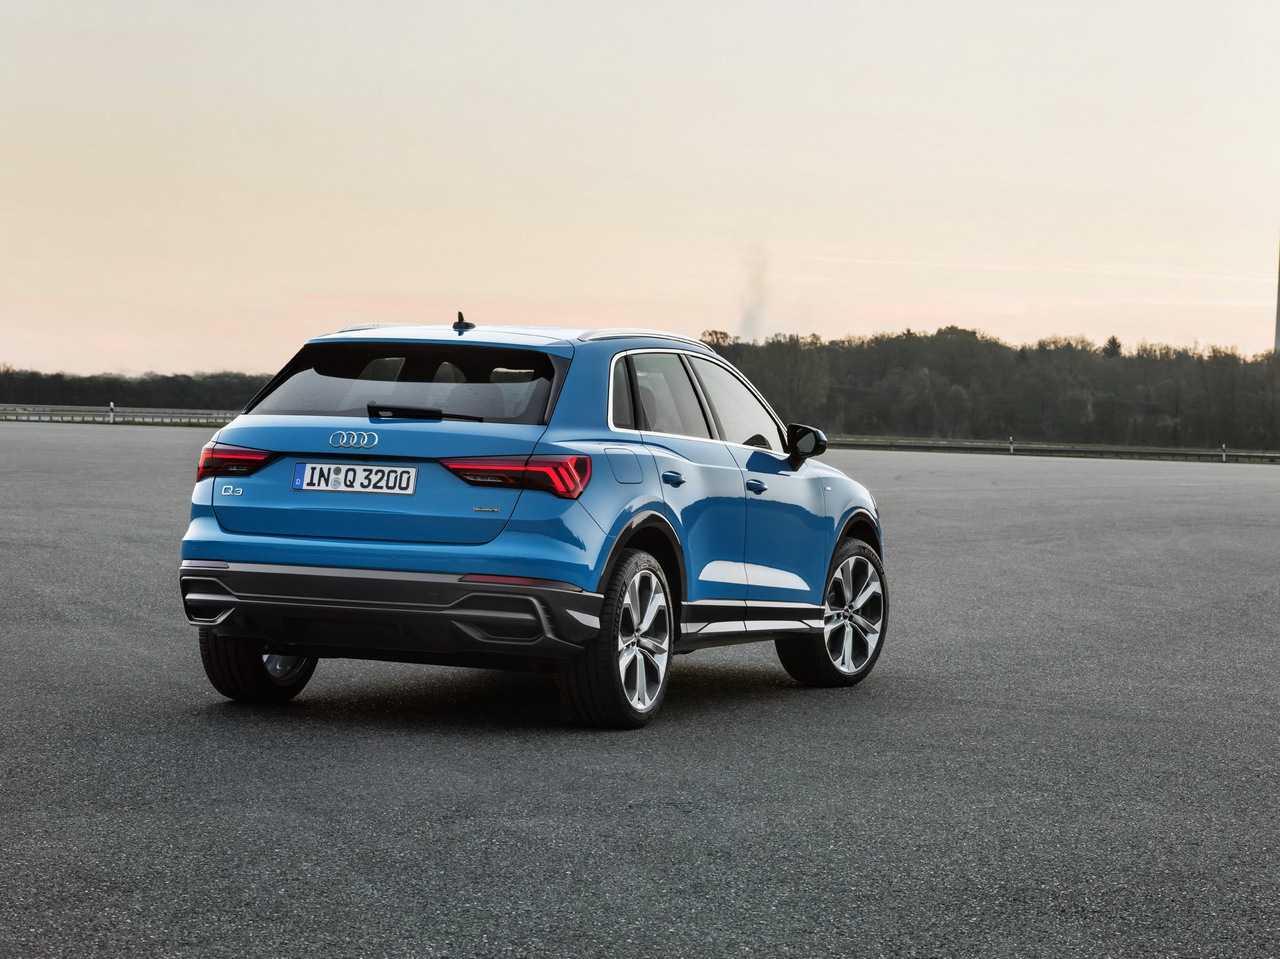 Audi q8 2020 в новом кузове, цены, комплектации, фото, видео тест-драйв